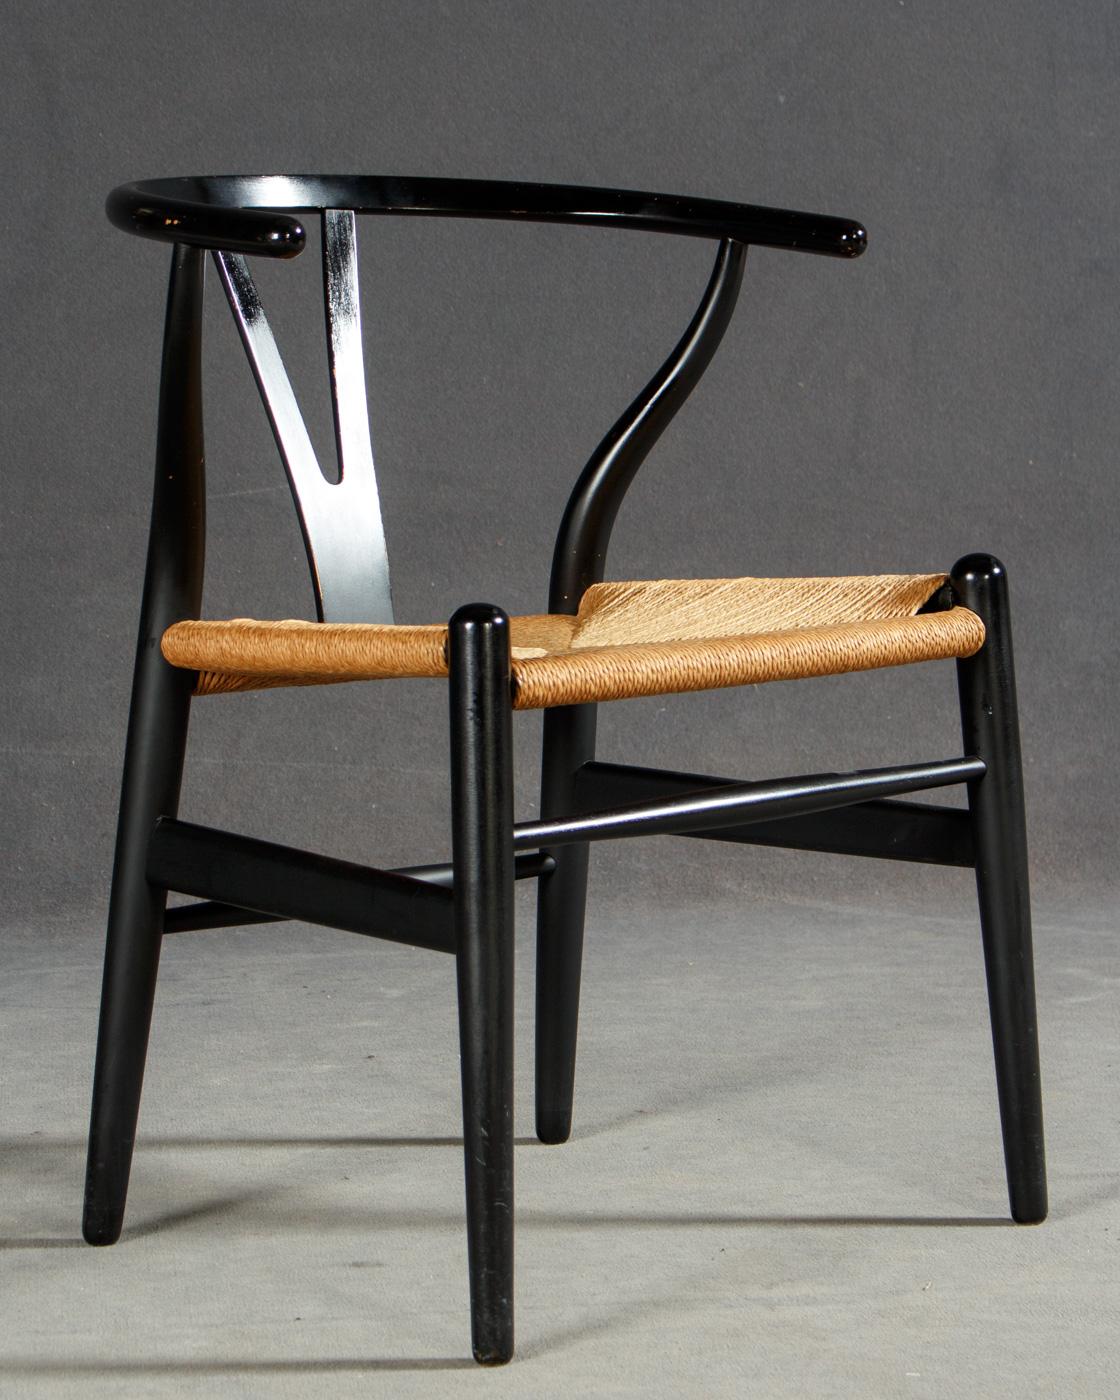 Hans J. Wegner, Stuhl Modell CH24 (Ypsilonchair / Y Chair) / Modell No. 24  Wishbone) Für Carl Hansen U0026 Søn